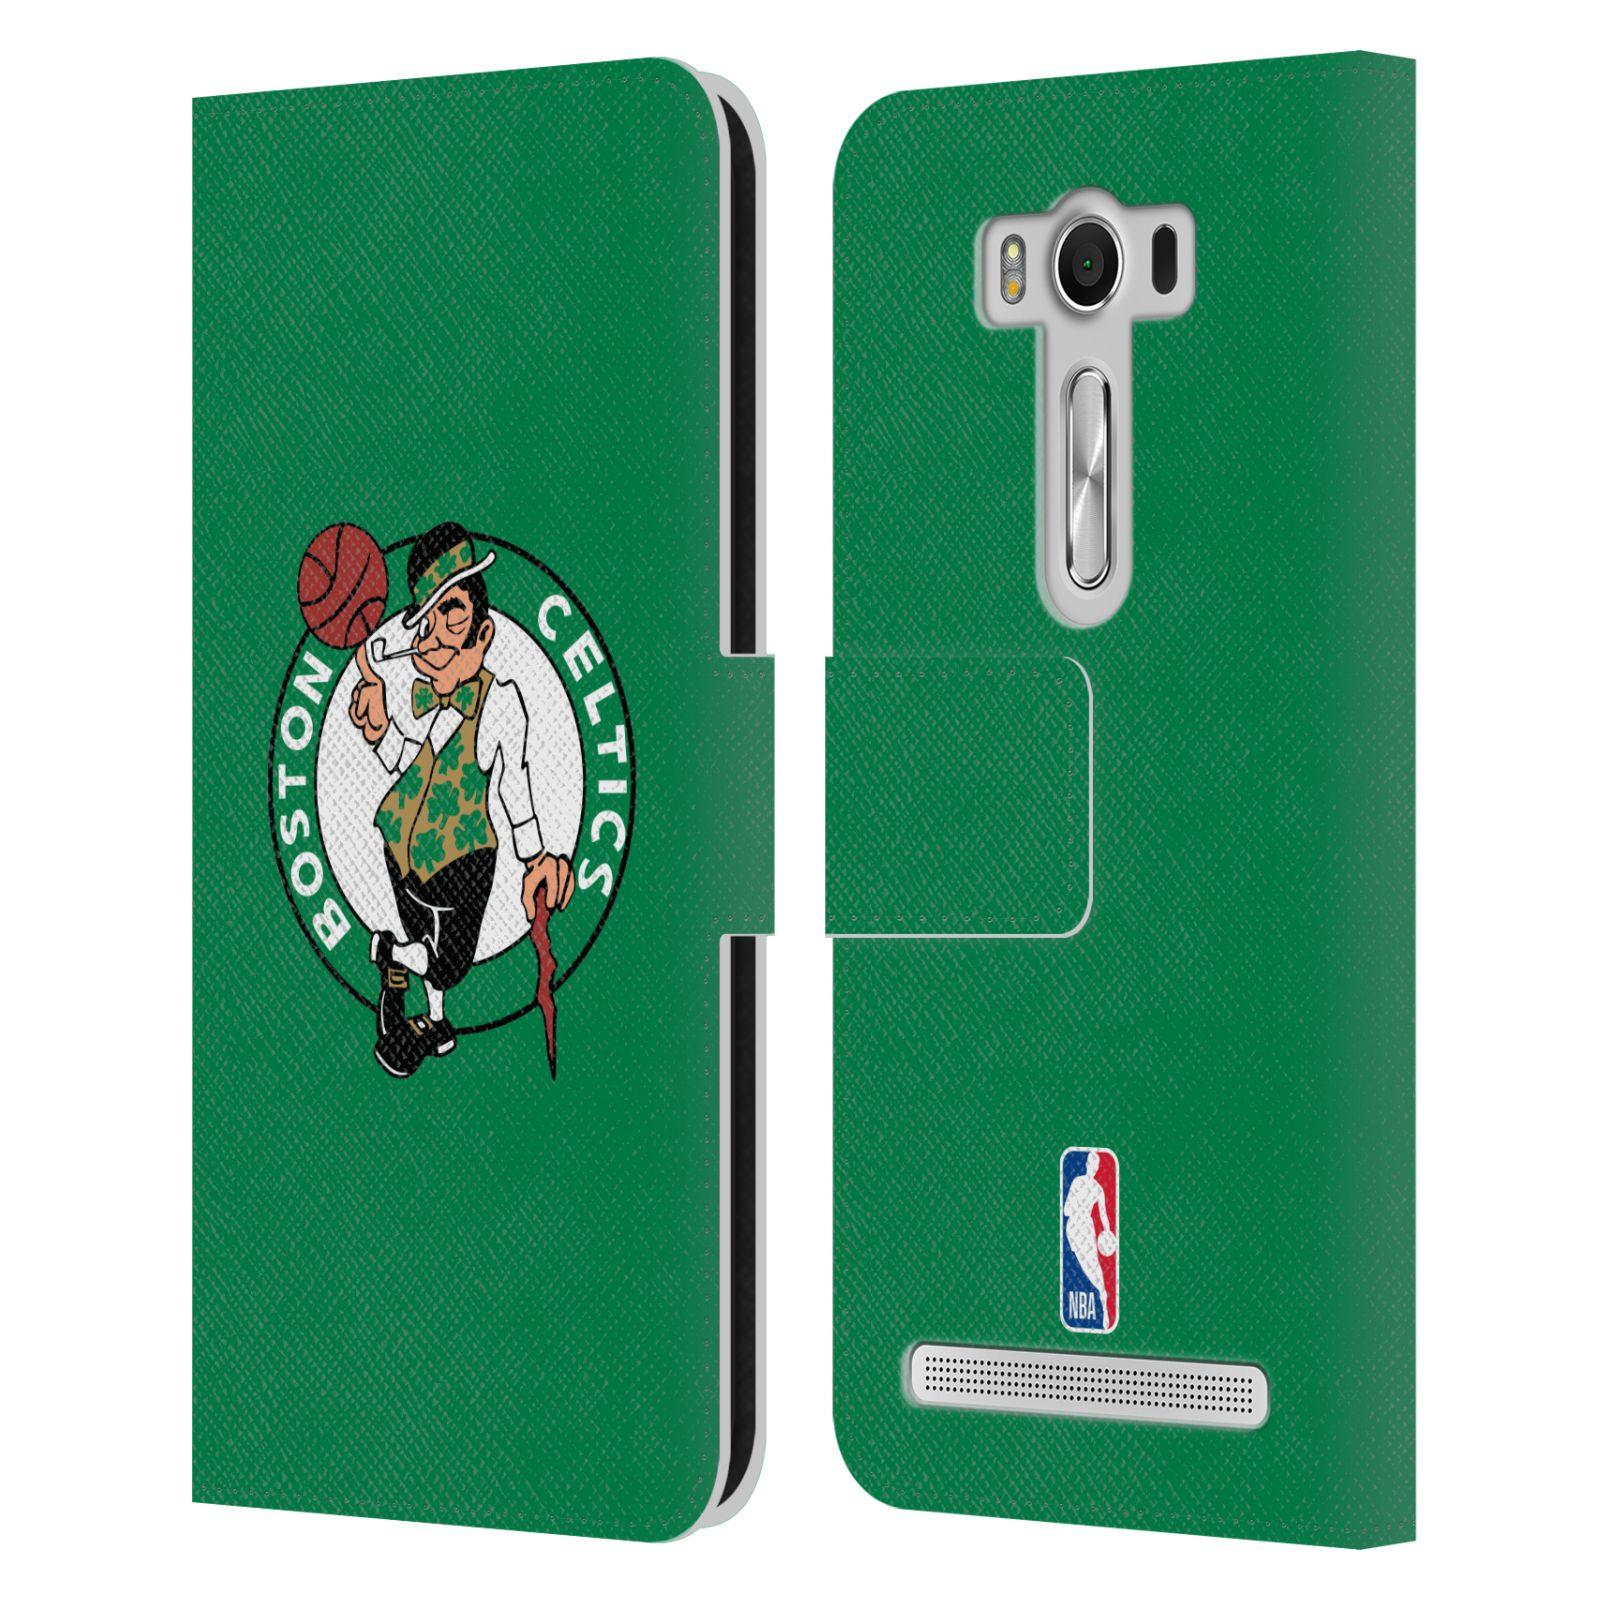 Pouzdro na mobil Asus Zenfone 2 Laser ZE500KL - Head Case - NBA - Boston Celtics zelená barva znak